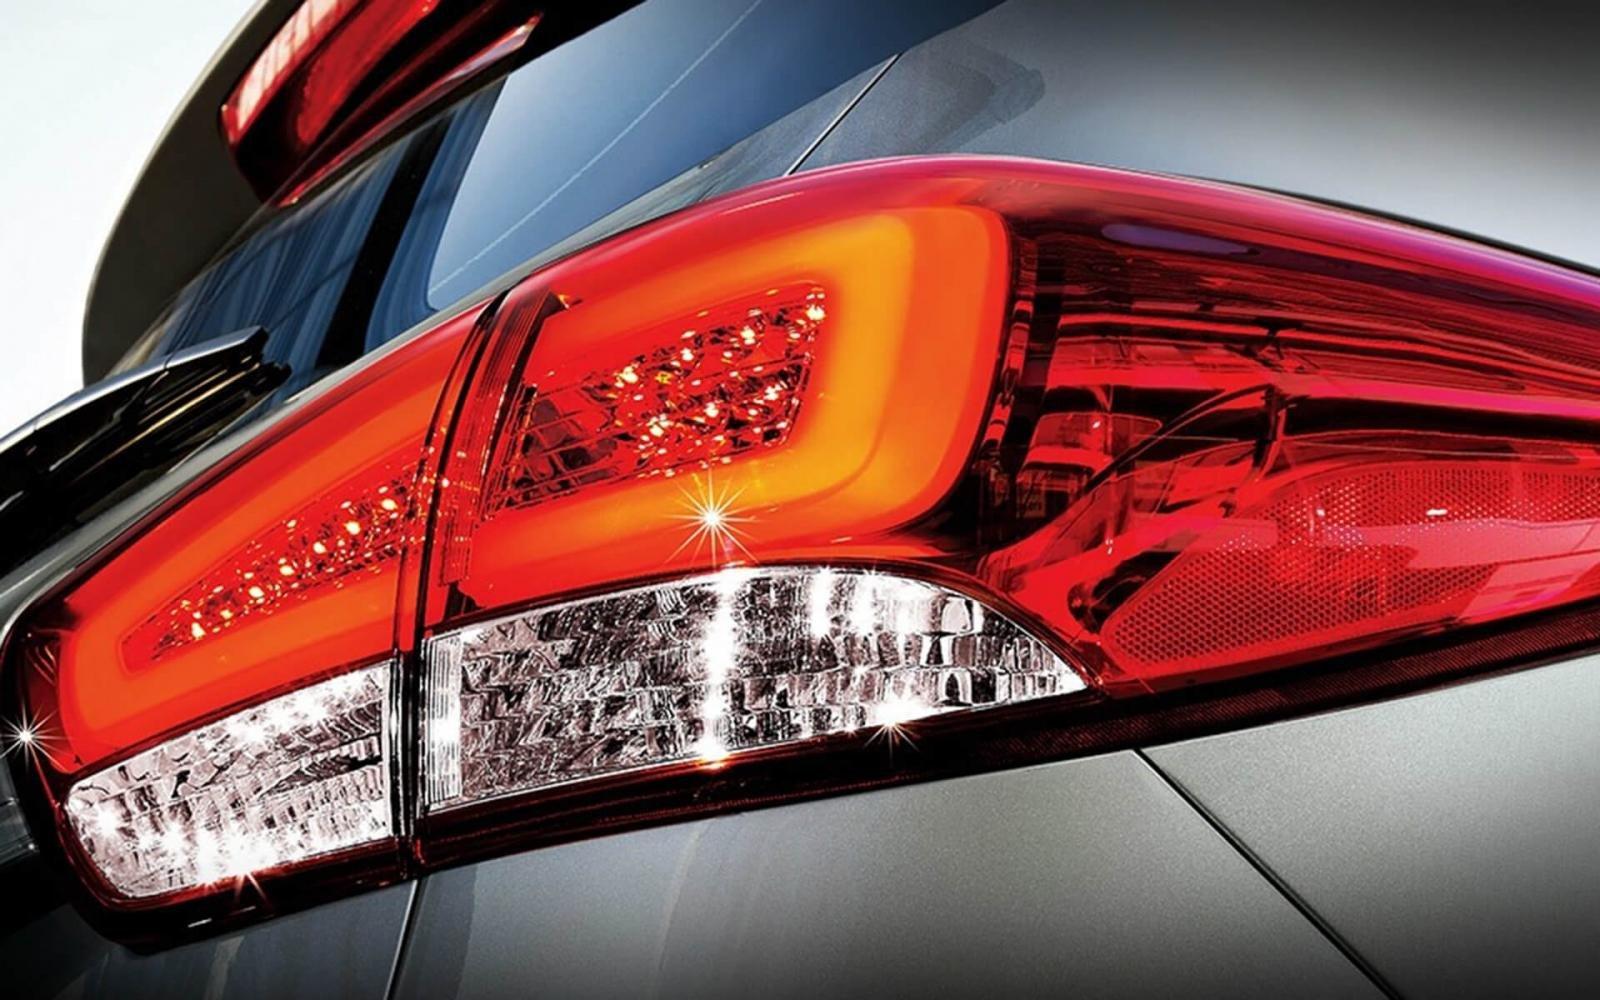 đèn hậu xeKia Rondo2021.